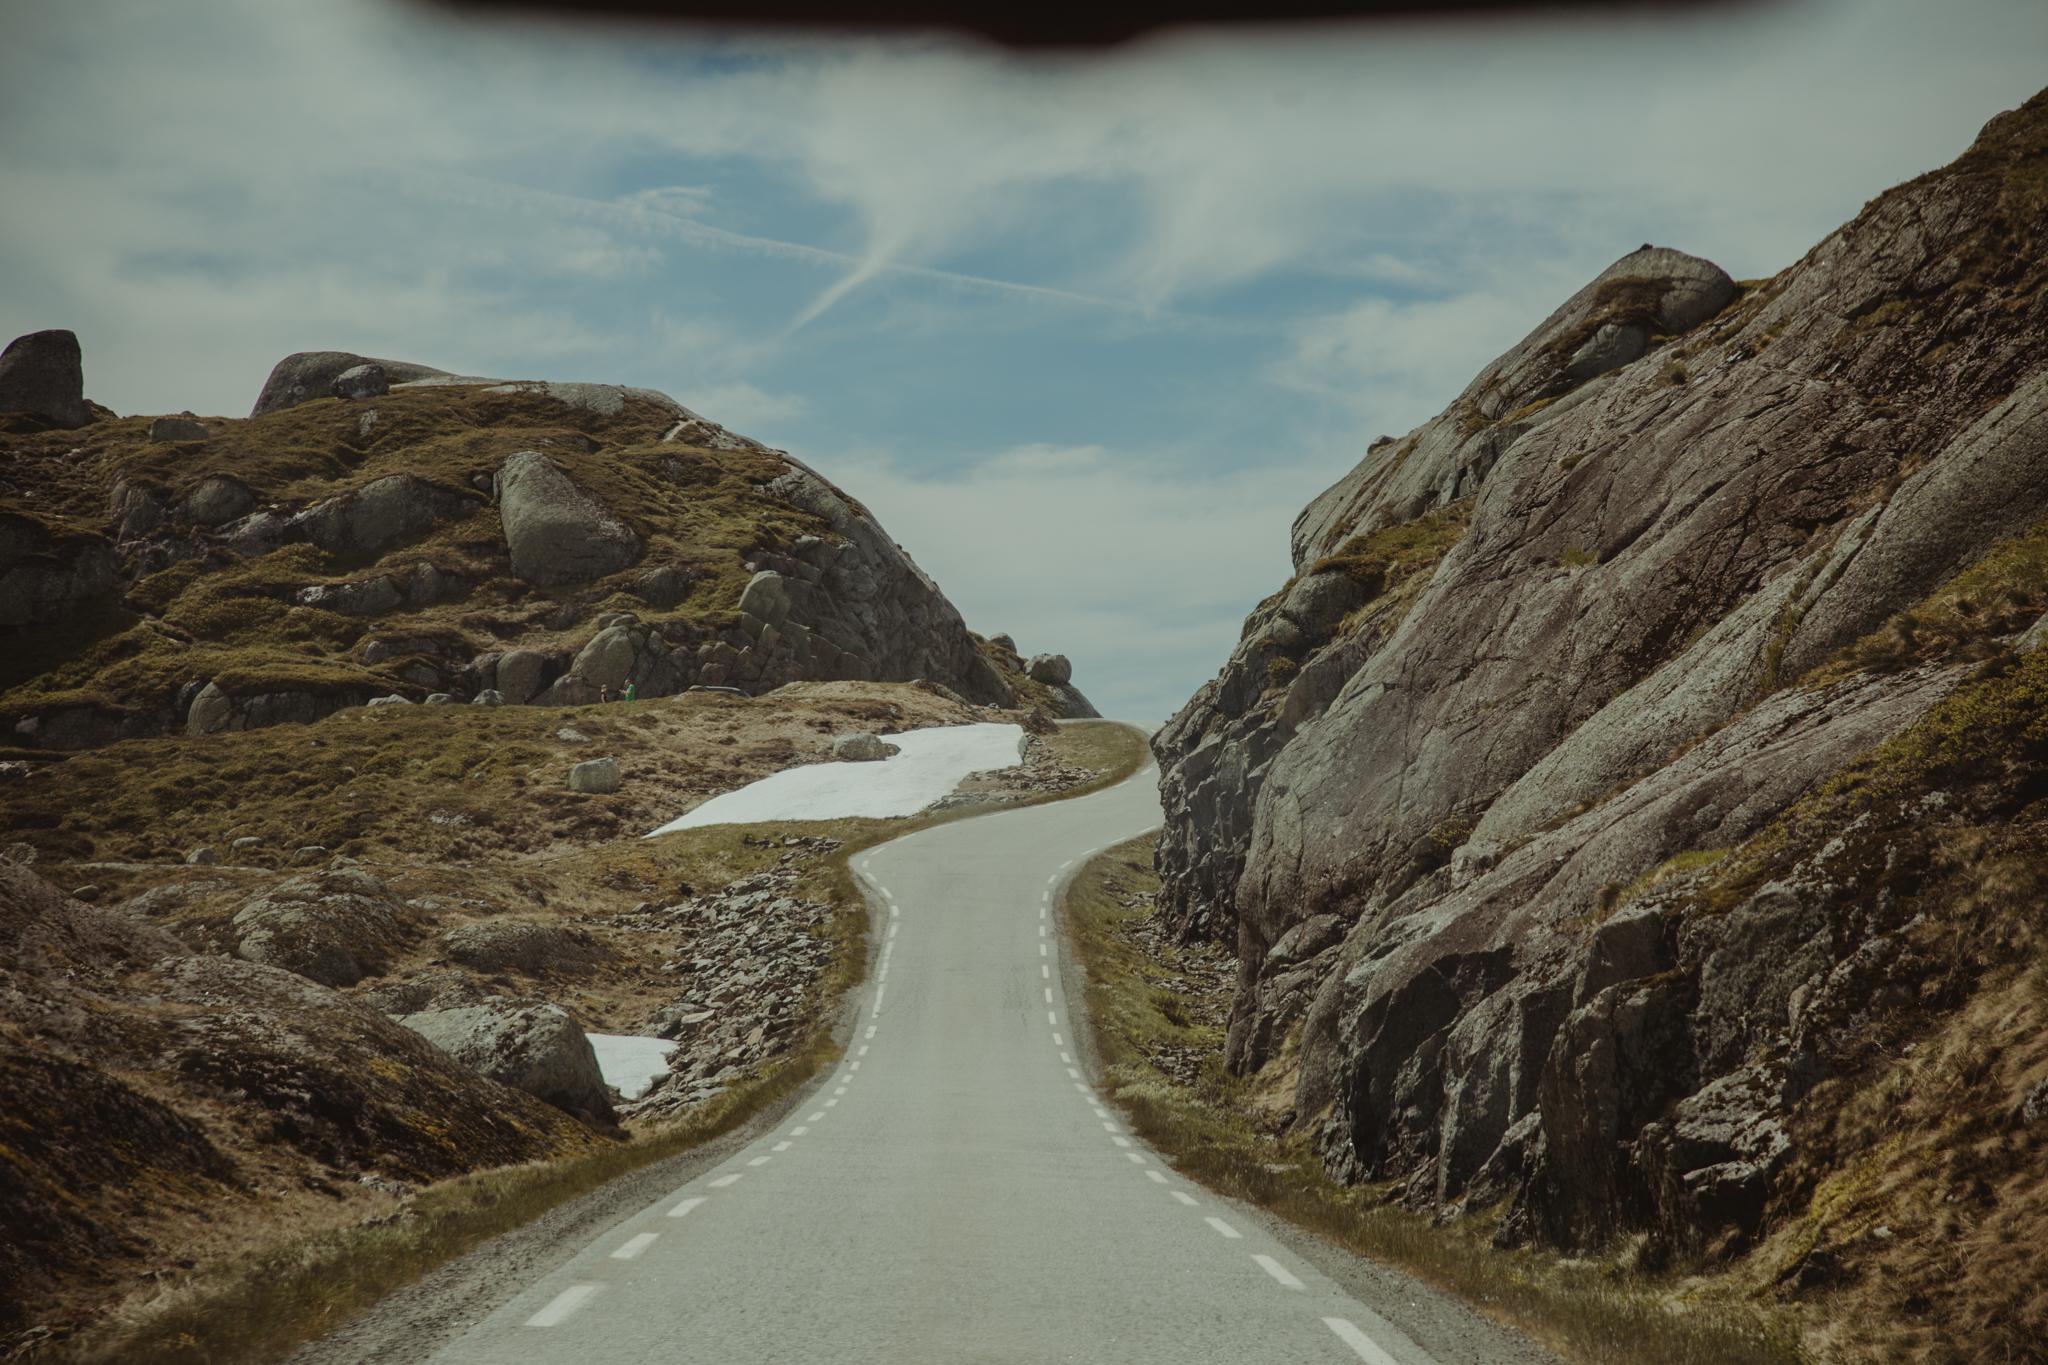 droga-na-kjerag-norwegia-co-zobaczyc